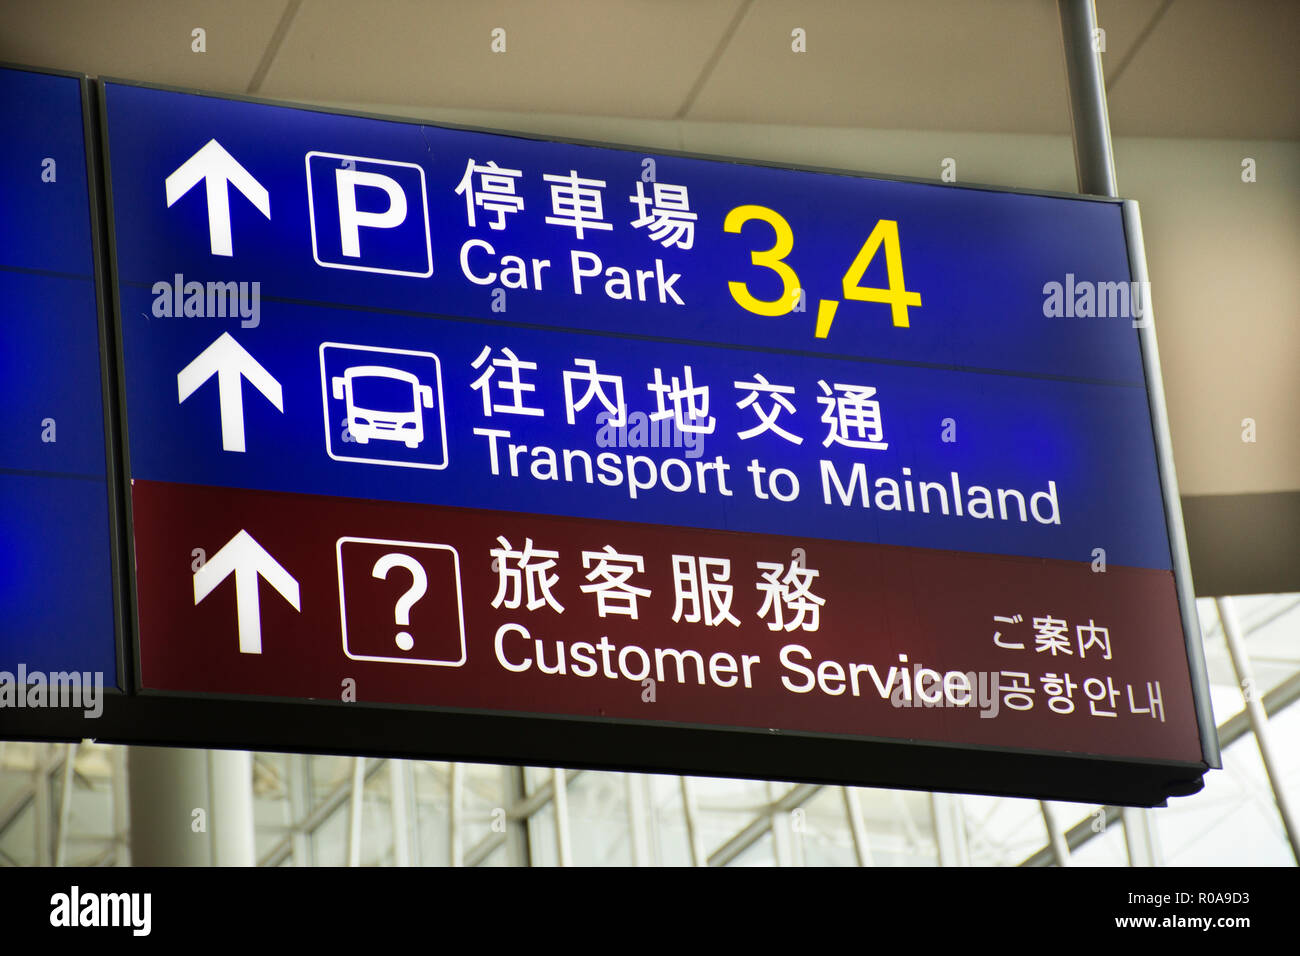 General and information board inside of Hong Kong International Airport or Chek Lap Kok Airport on September 3, 2018 in Hong Kong, China - Stock Image